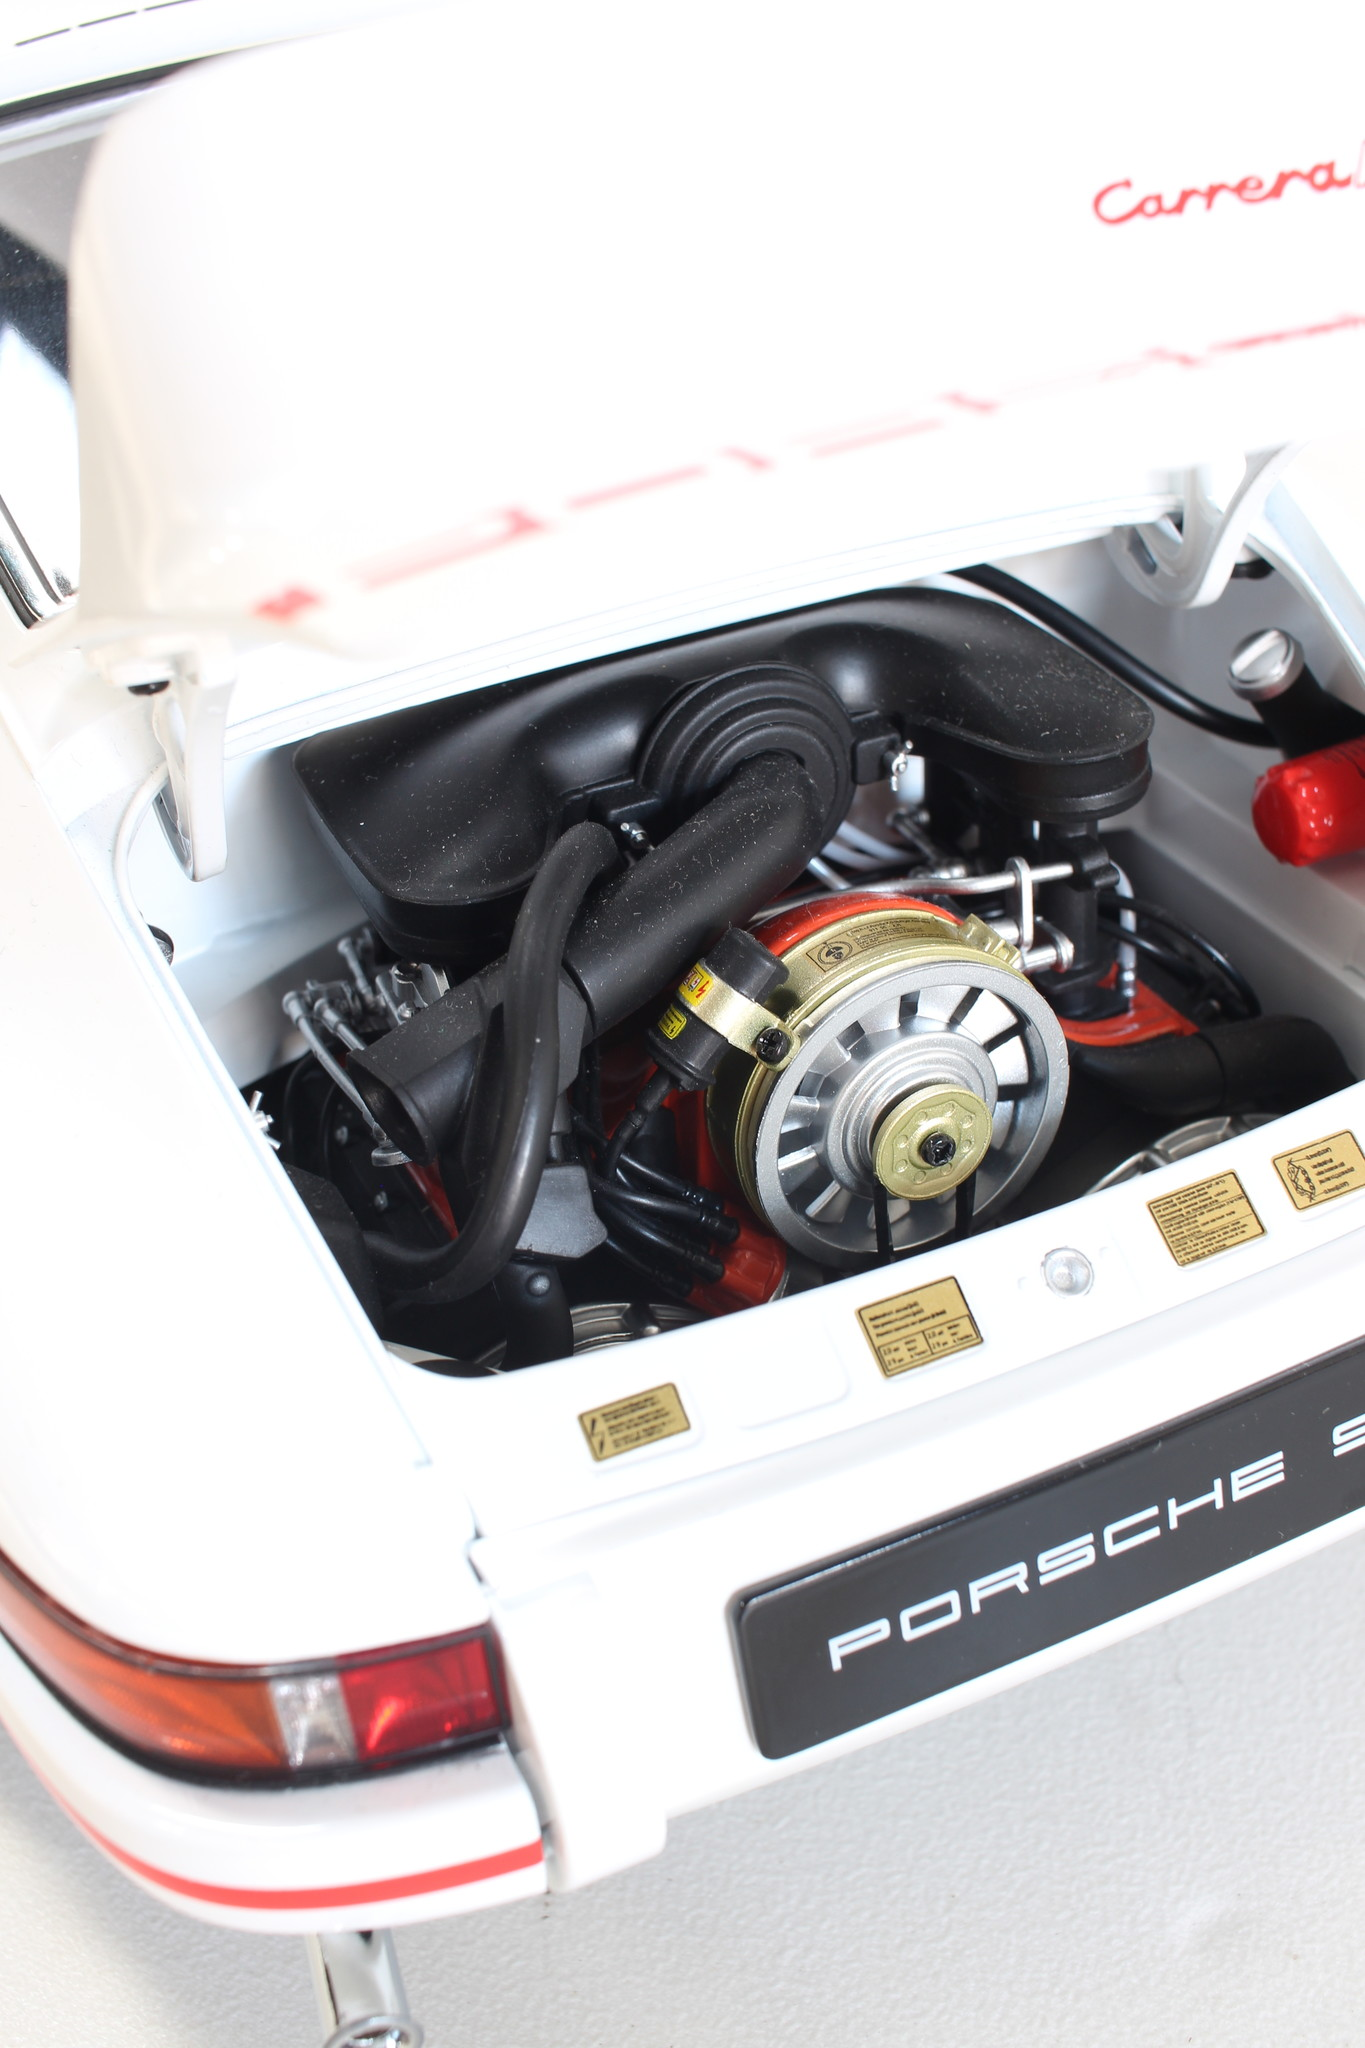 Porsche RS 1: 8 scale model